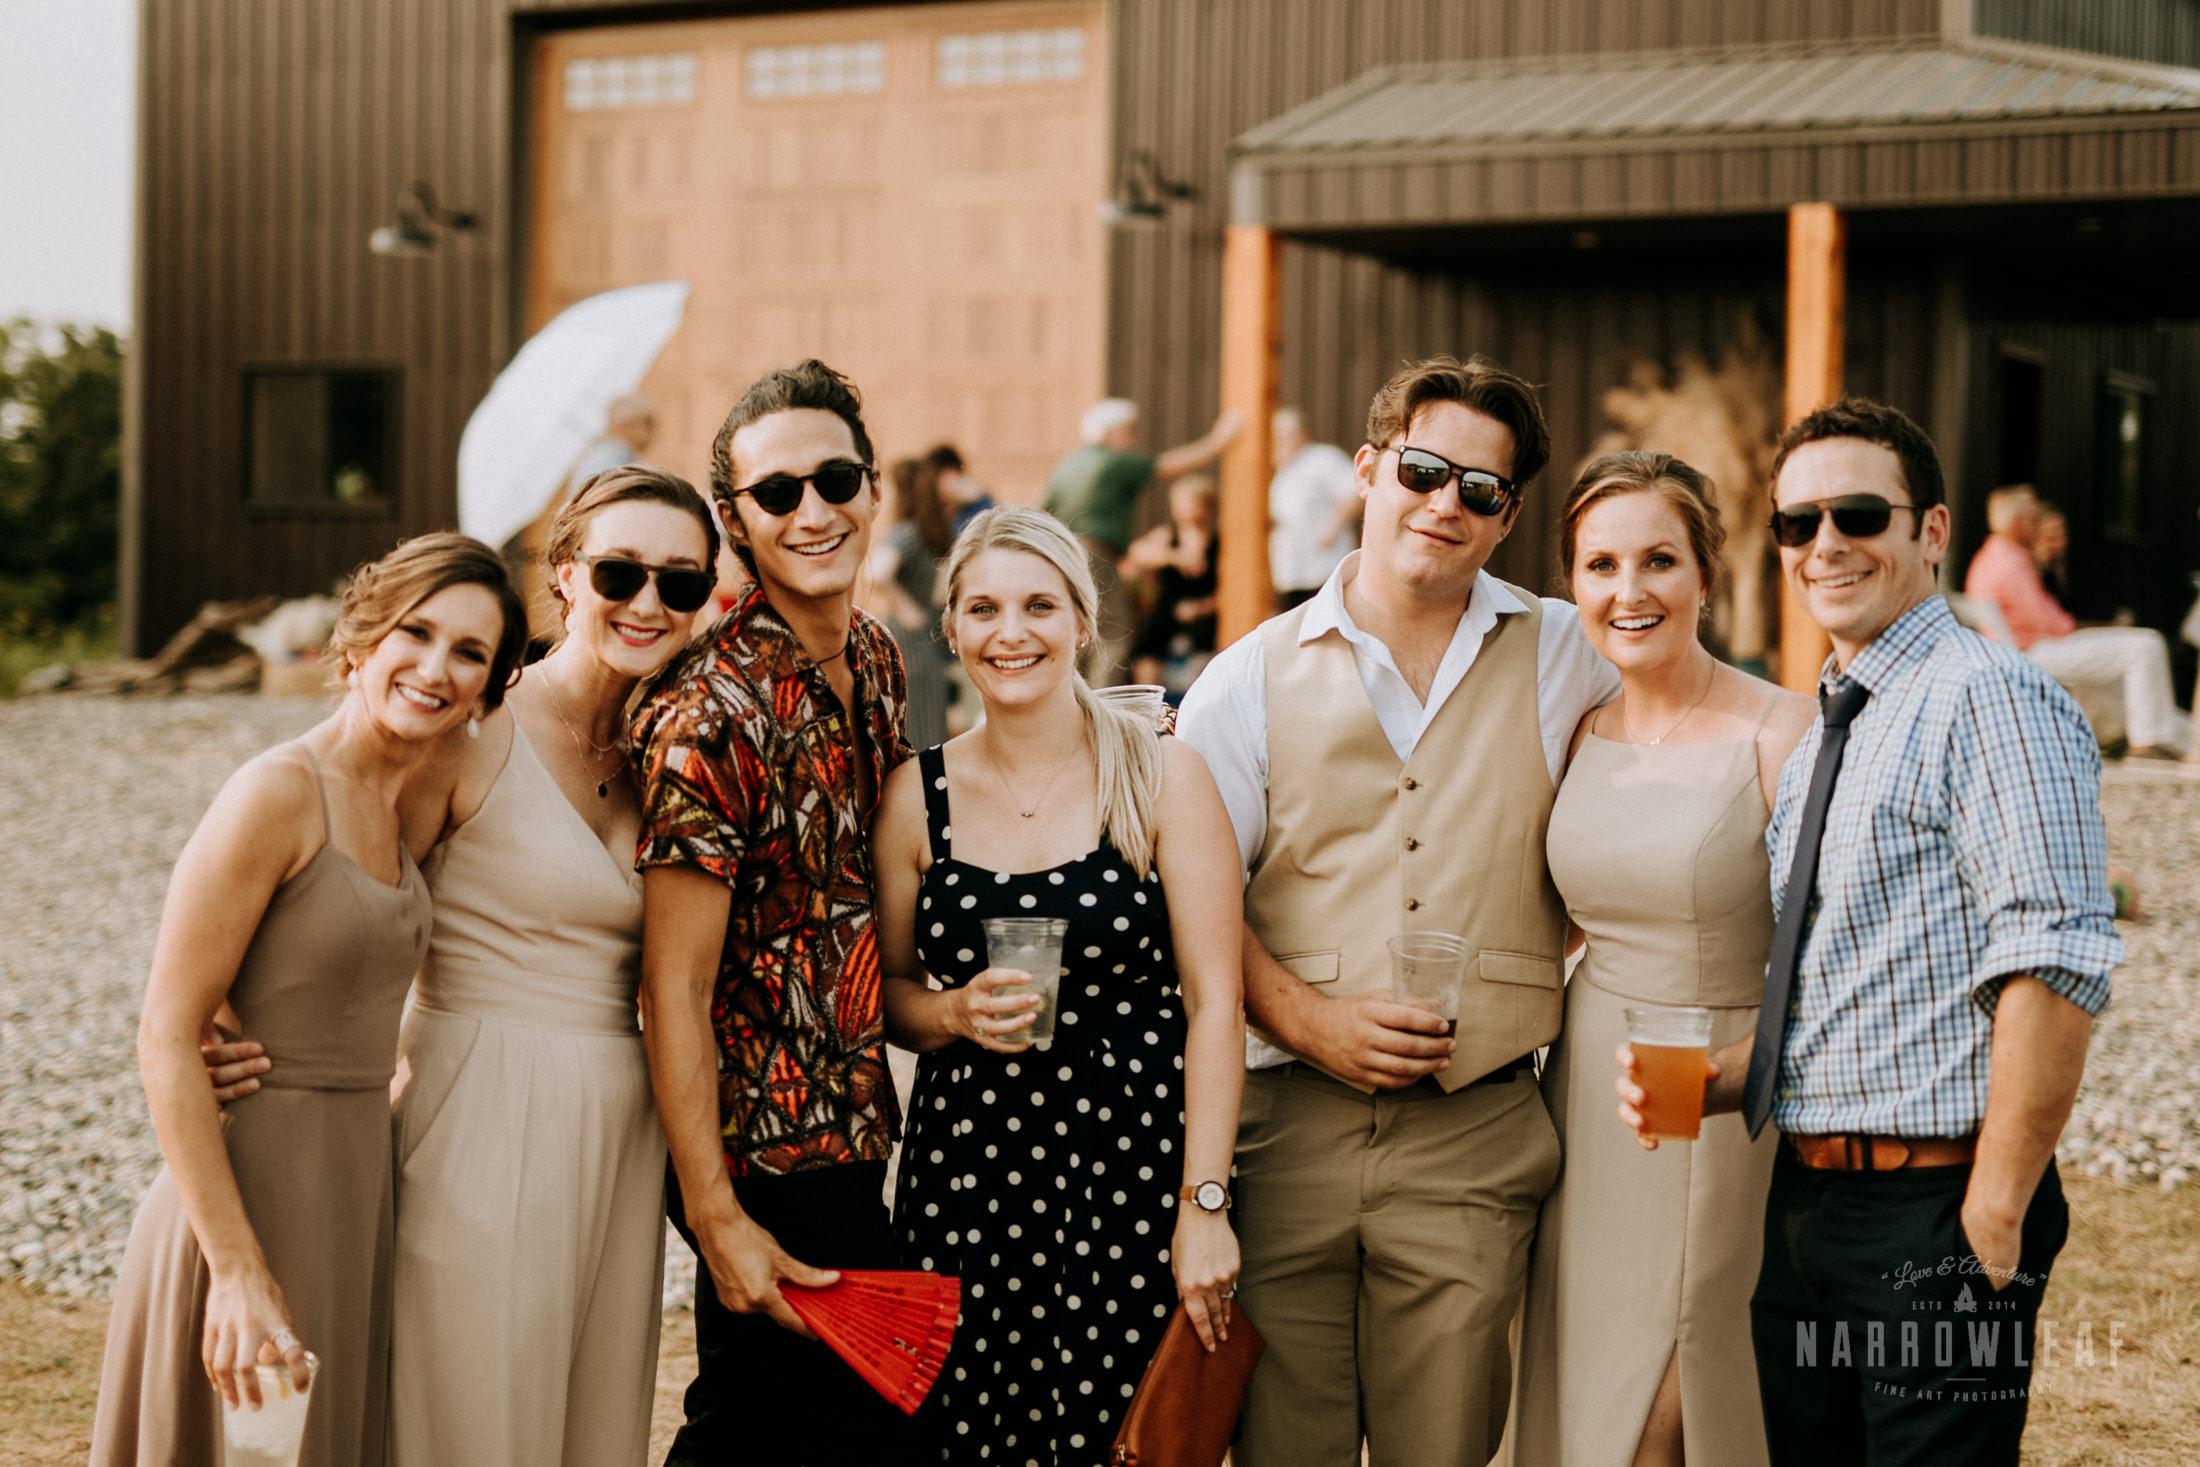 wisconsin-wedding-photographer-Narrowleaf_Love_and_Adventure_Photography-3269.jpg